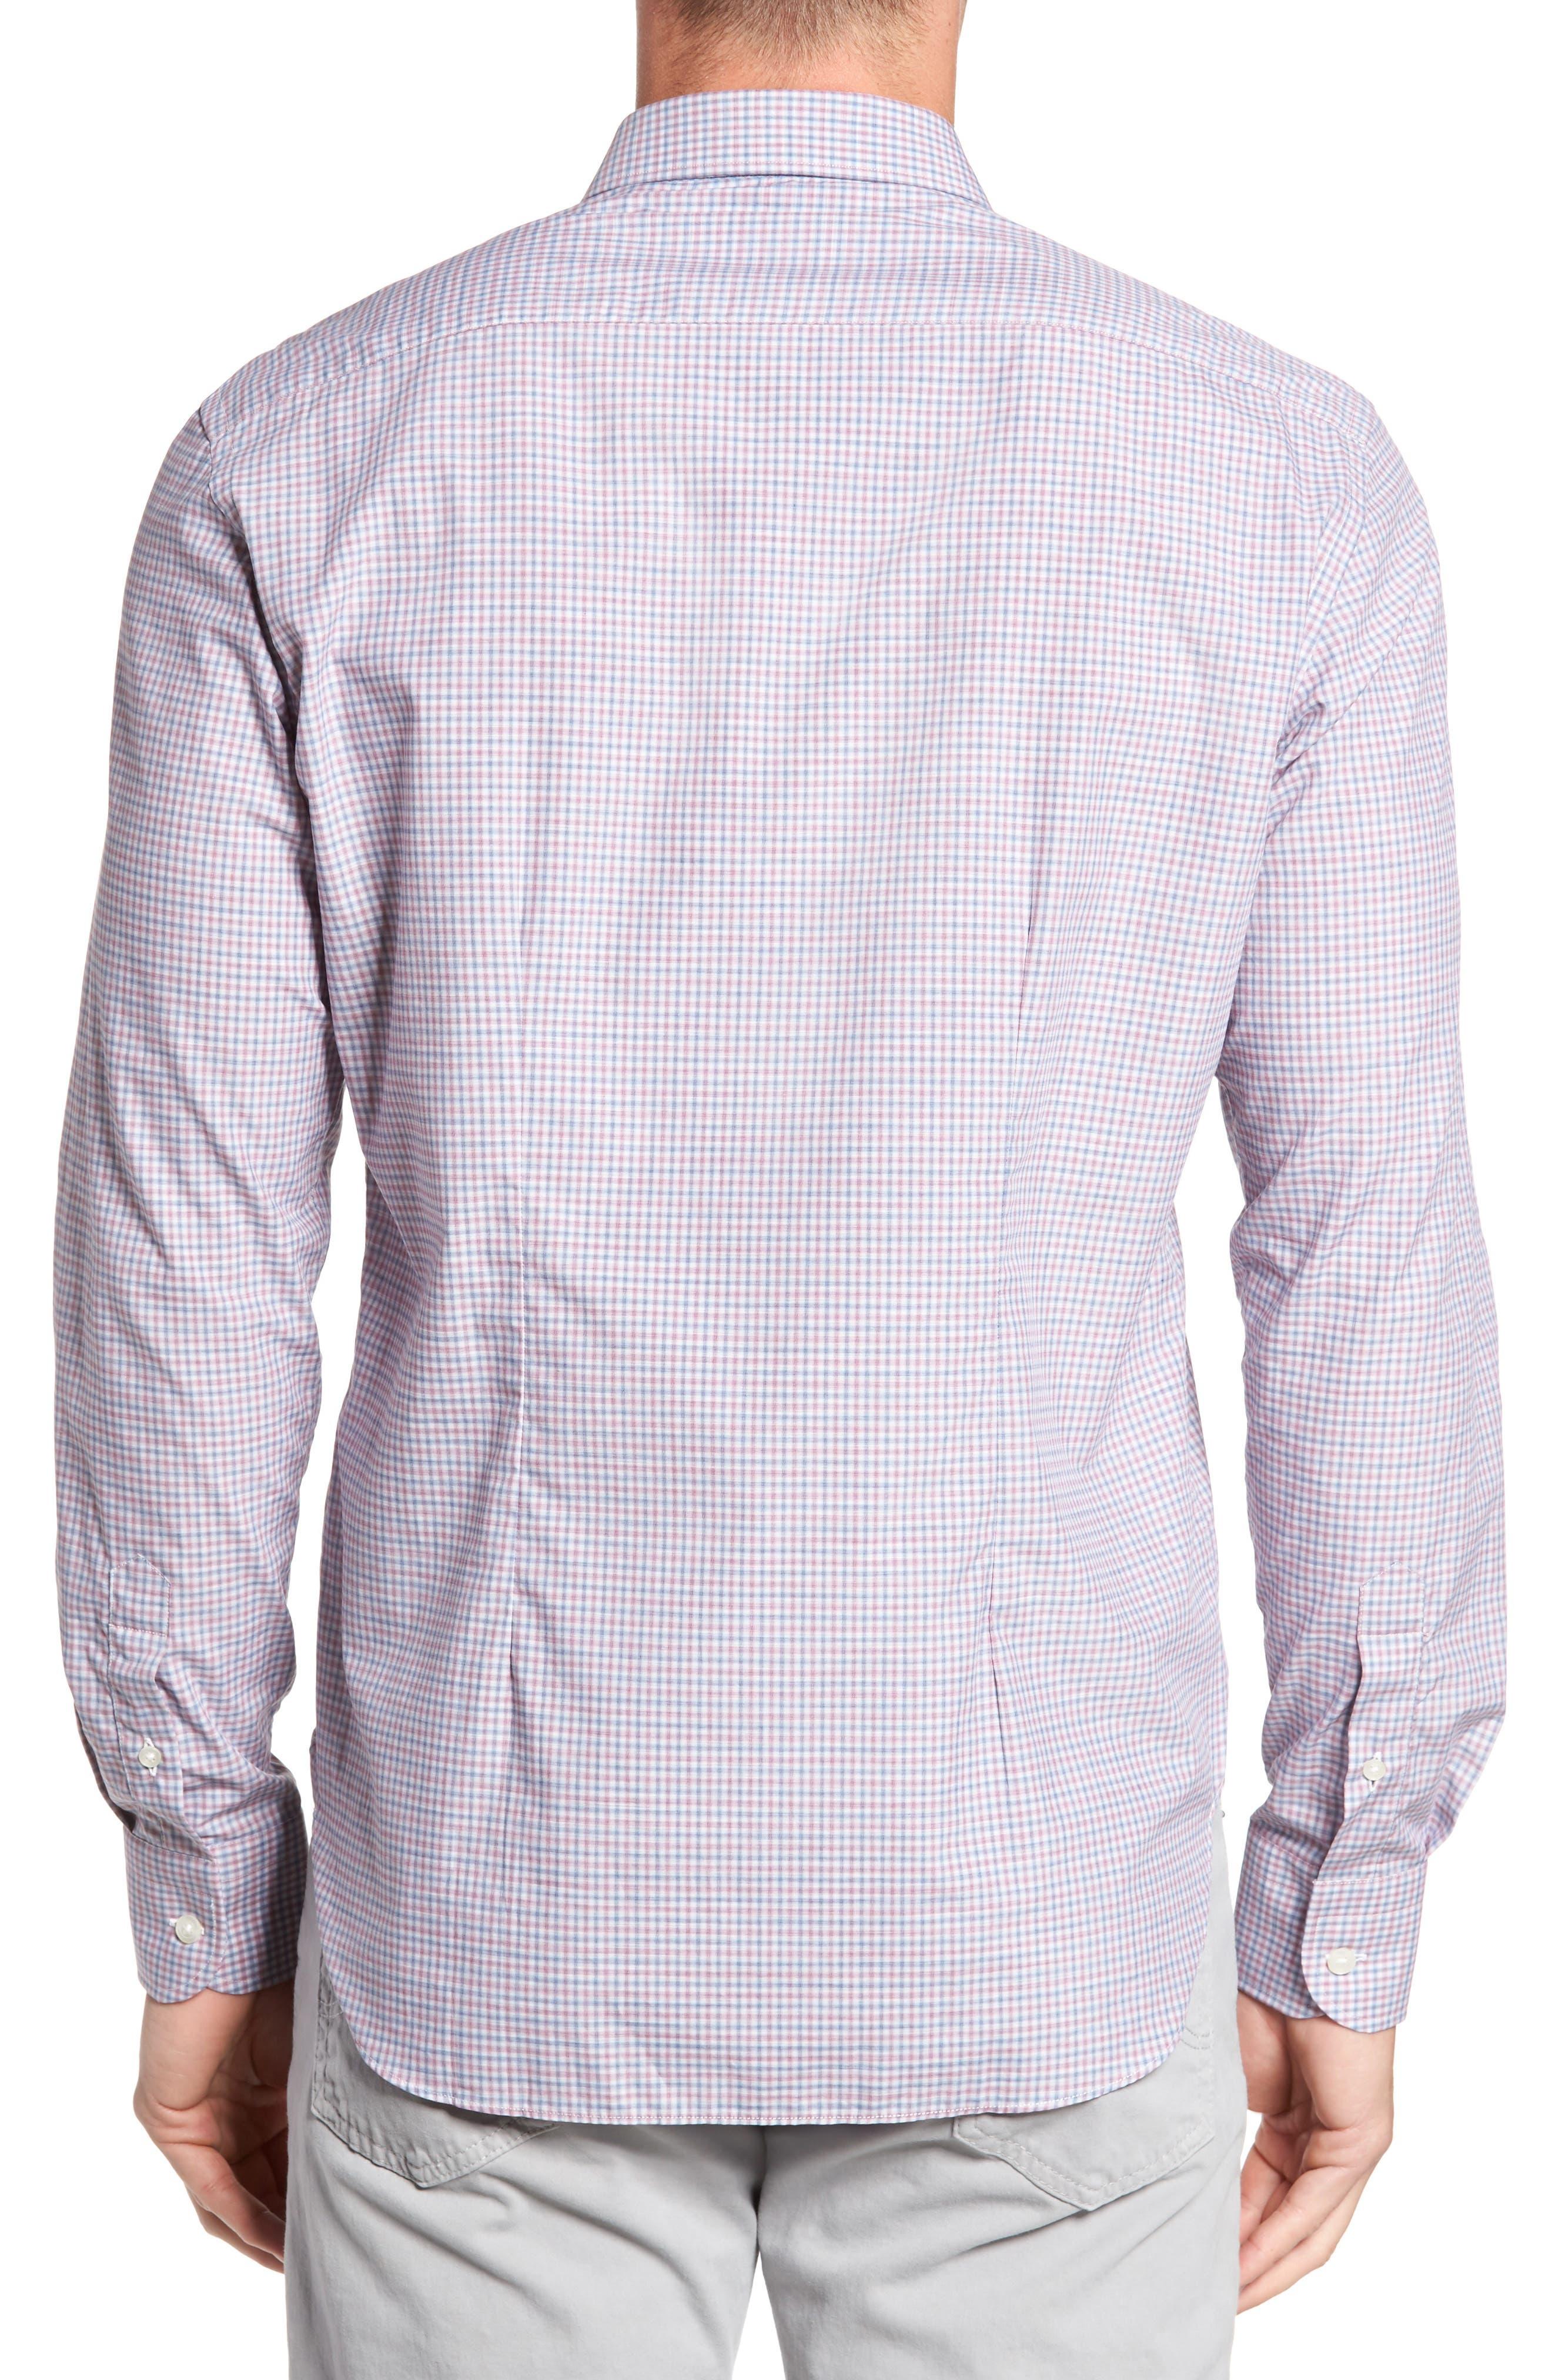 Alternate Image 2  - Culturata Trim Fit Mini Plaid Sport Shirt